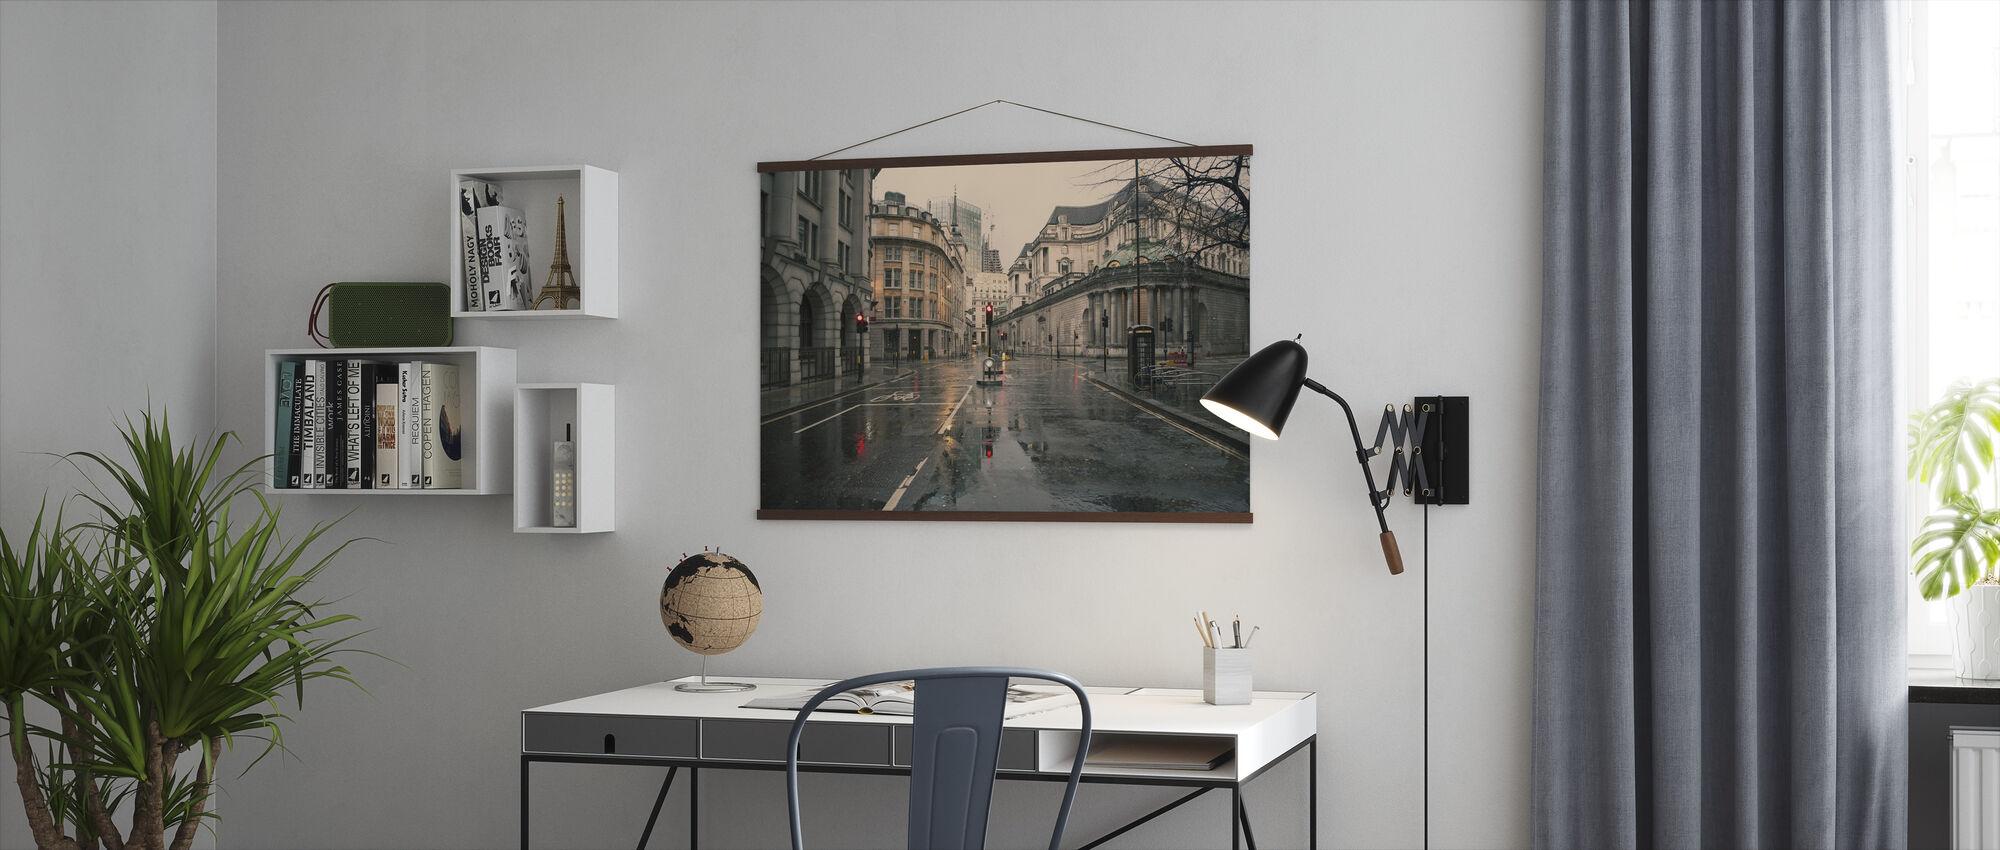 Skyfall - Poster - Office